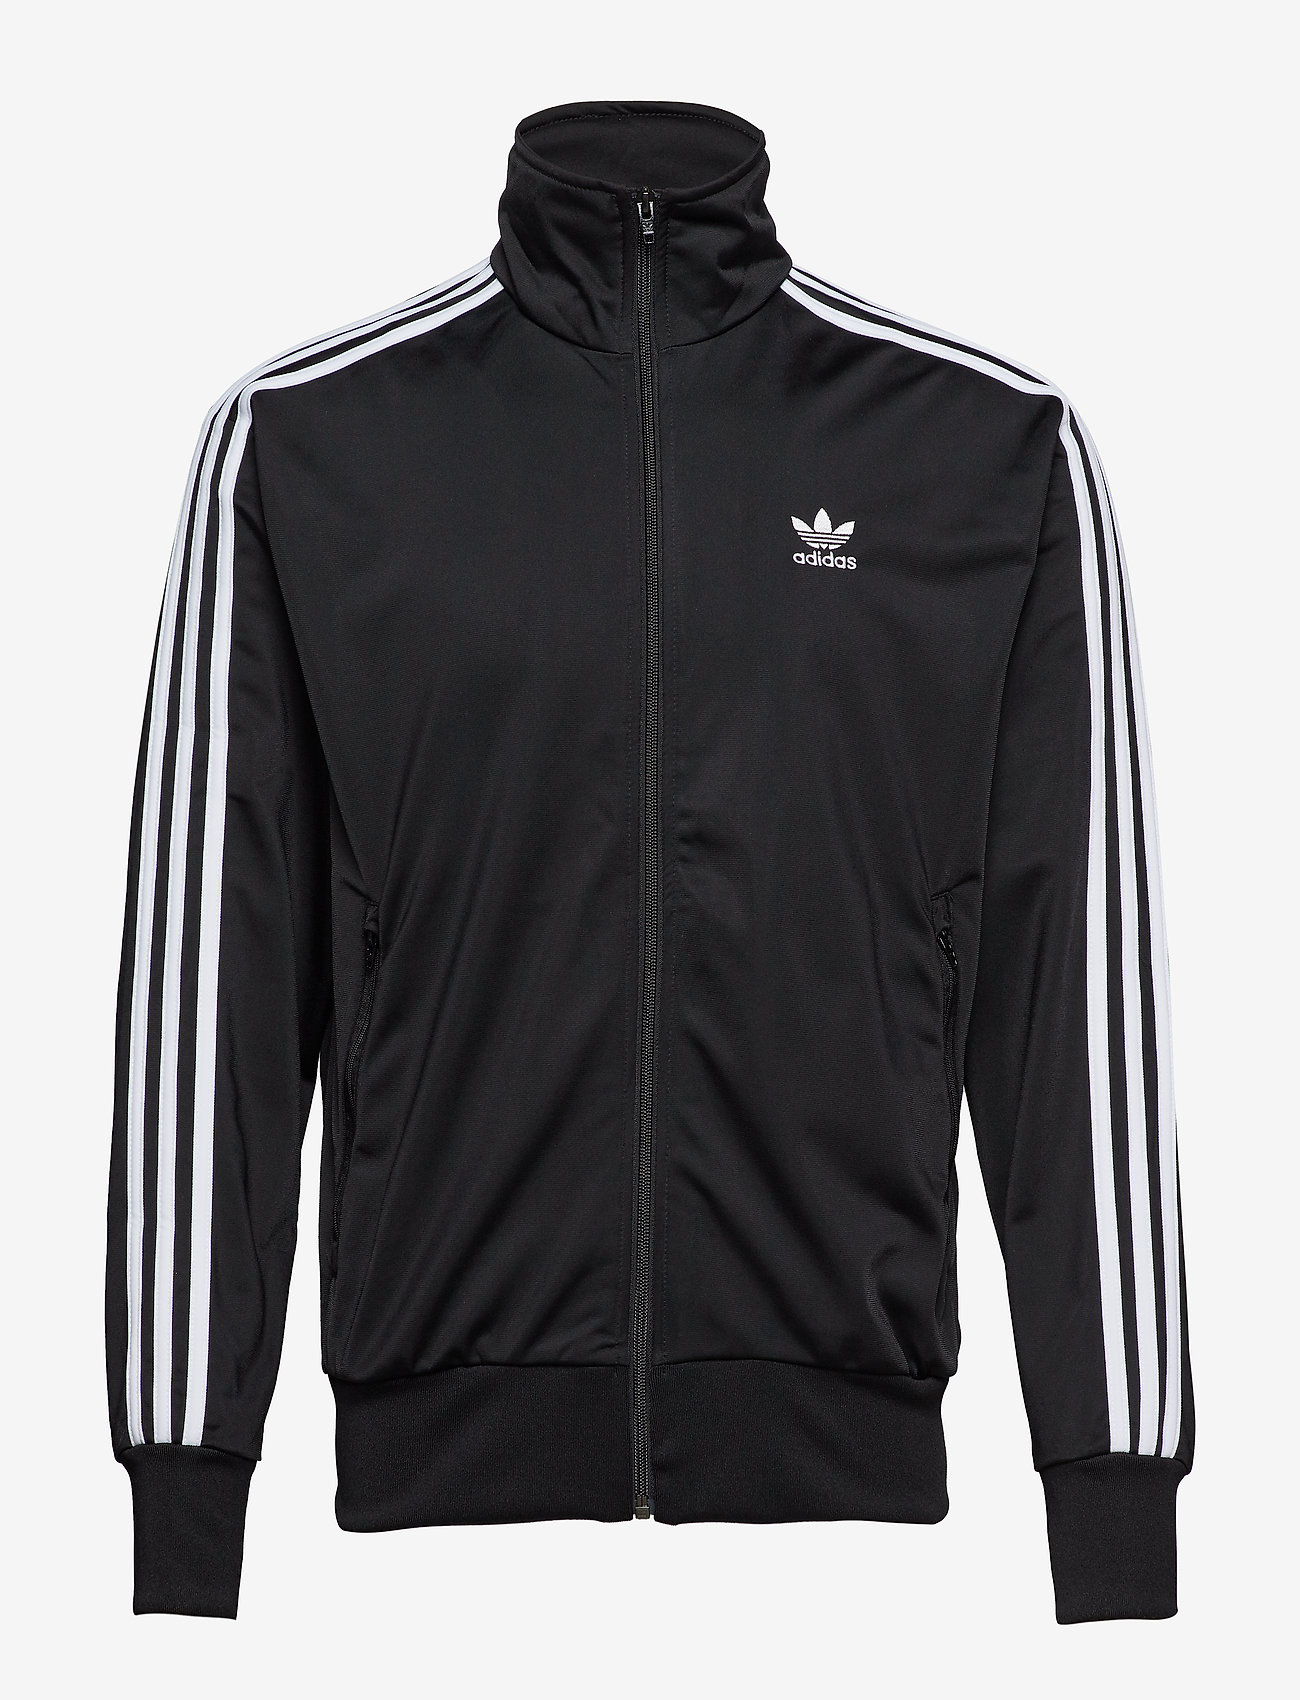 adidas Originals - FIREBIRD TT - podstawowe bluzy - black - 1